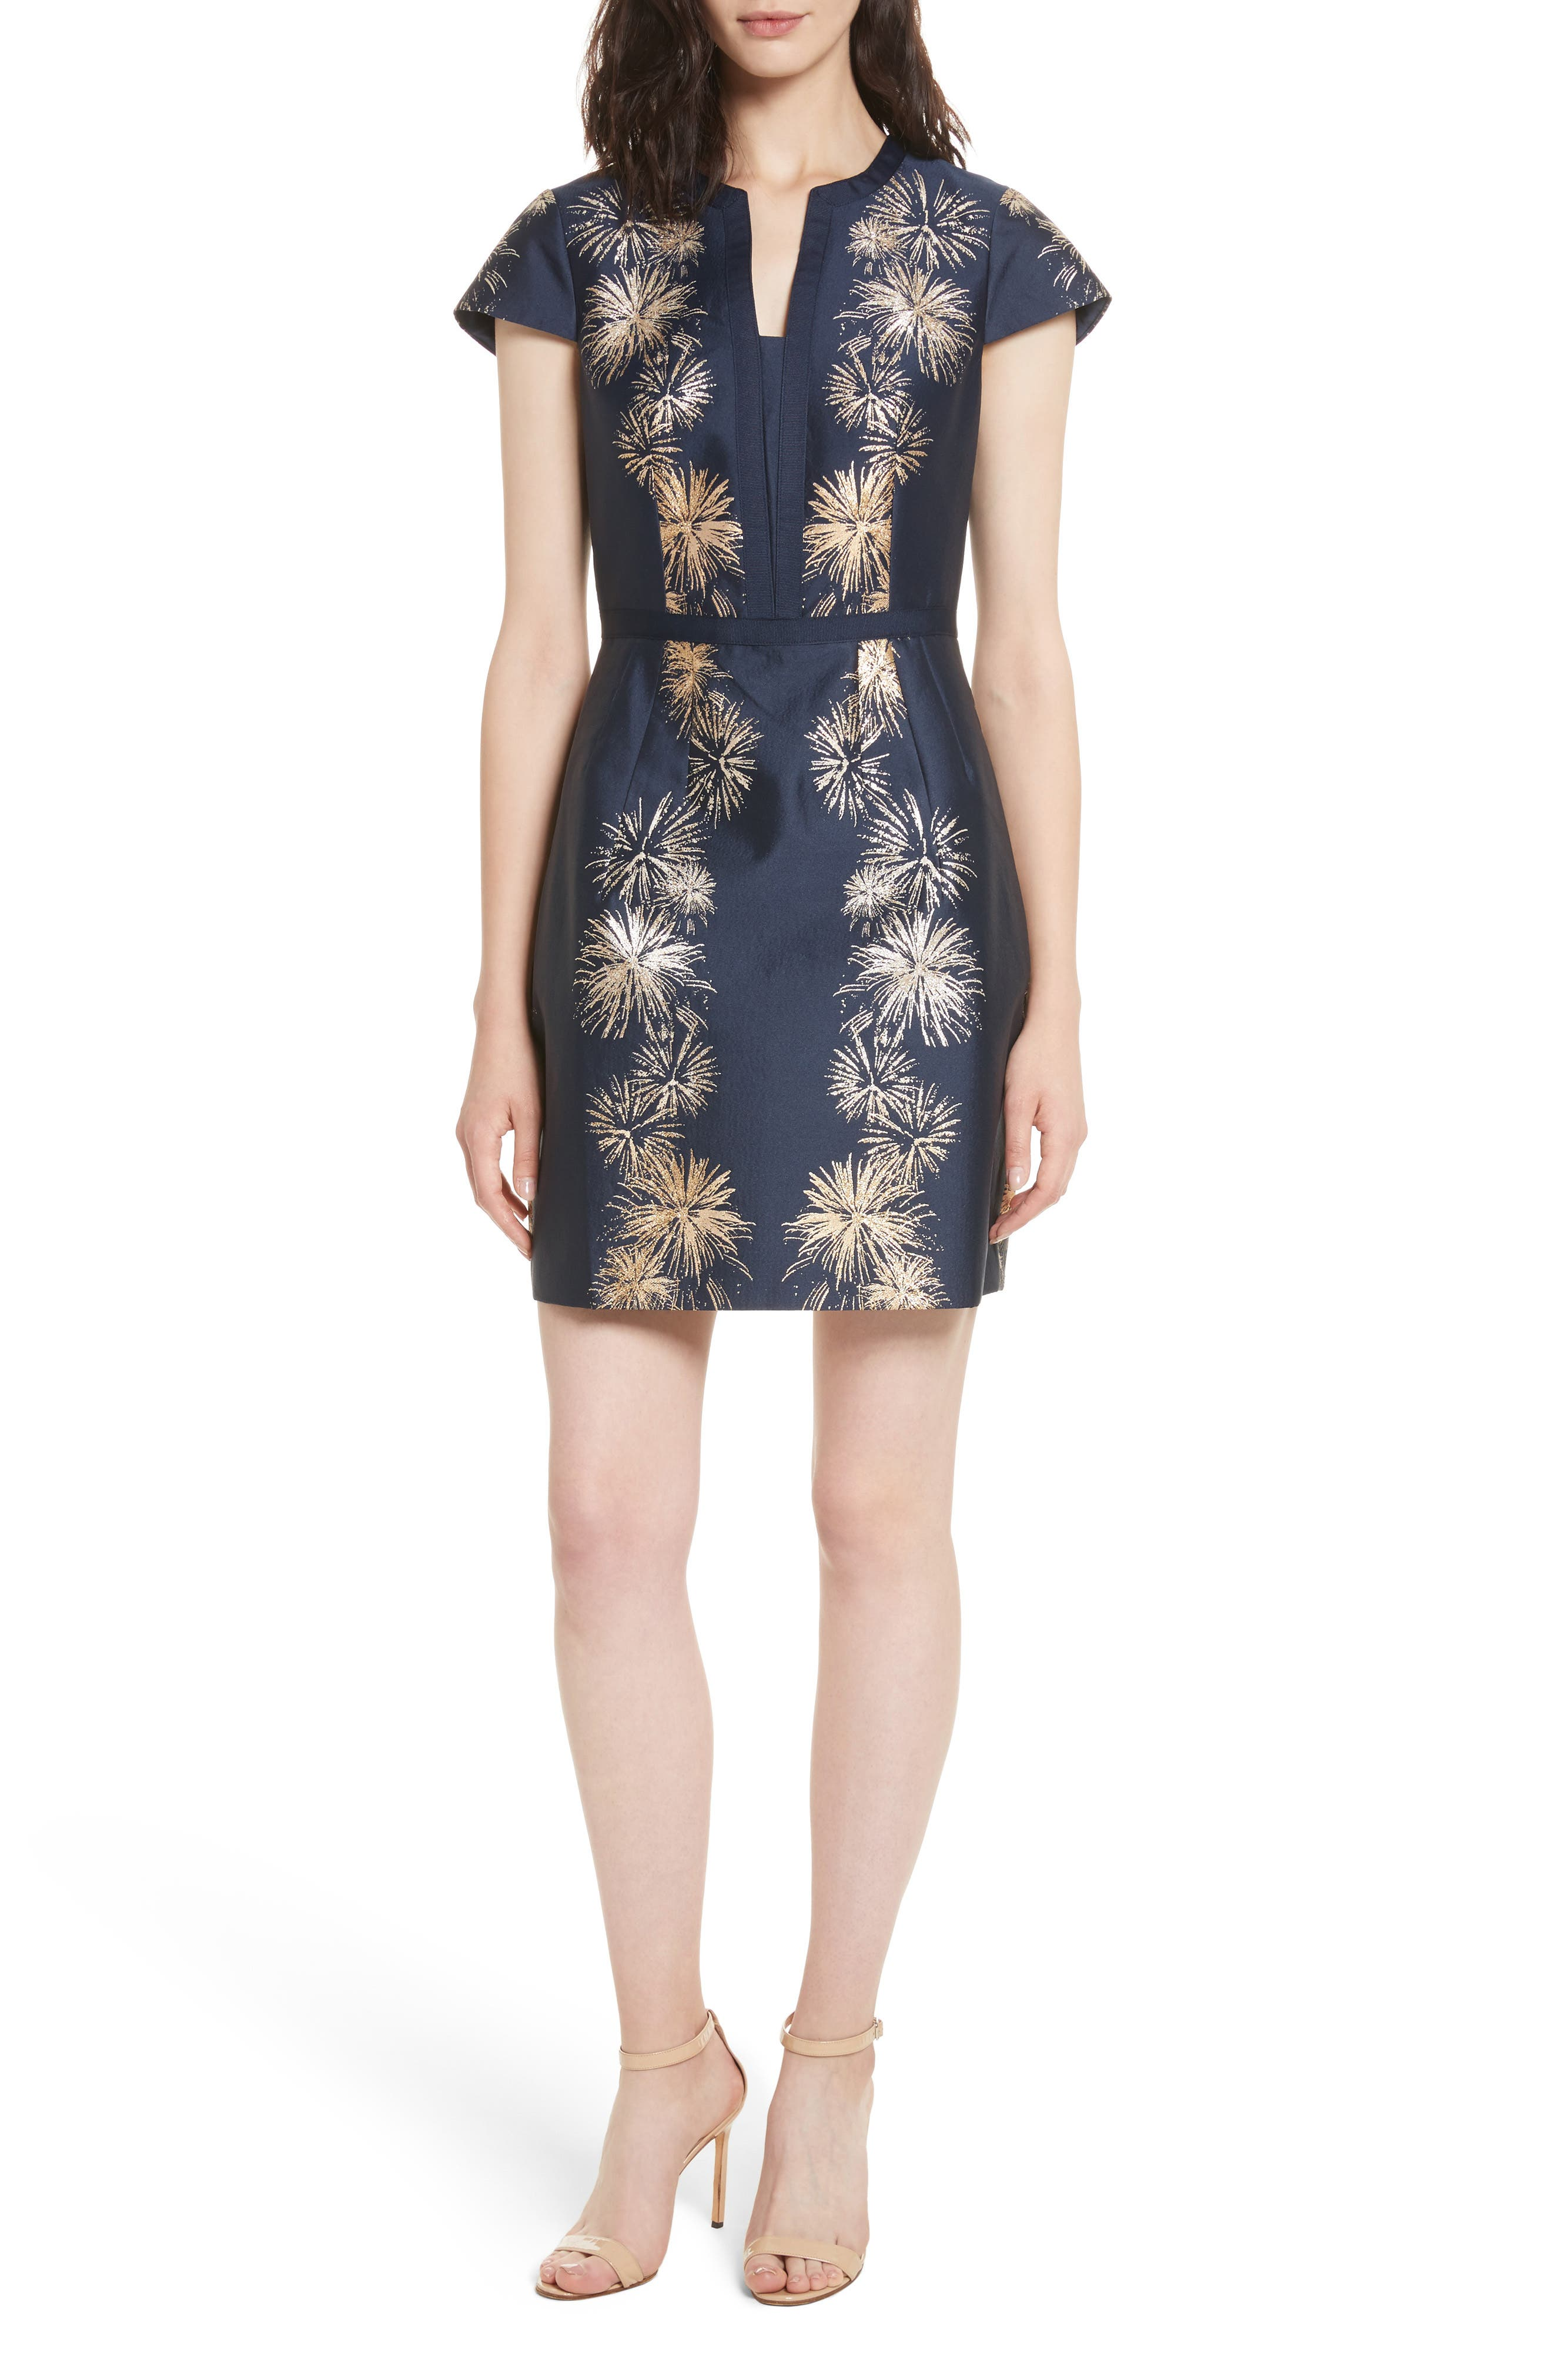 Tzalla Sculpted Stardust Jacquard Dress,                         Main,                         color, 402